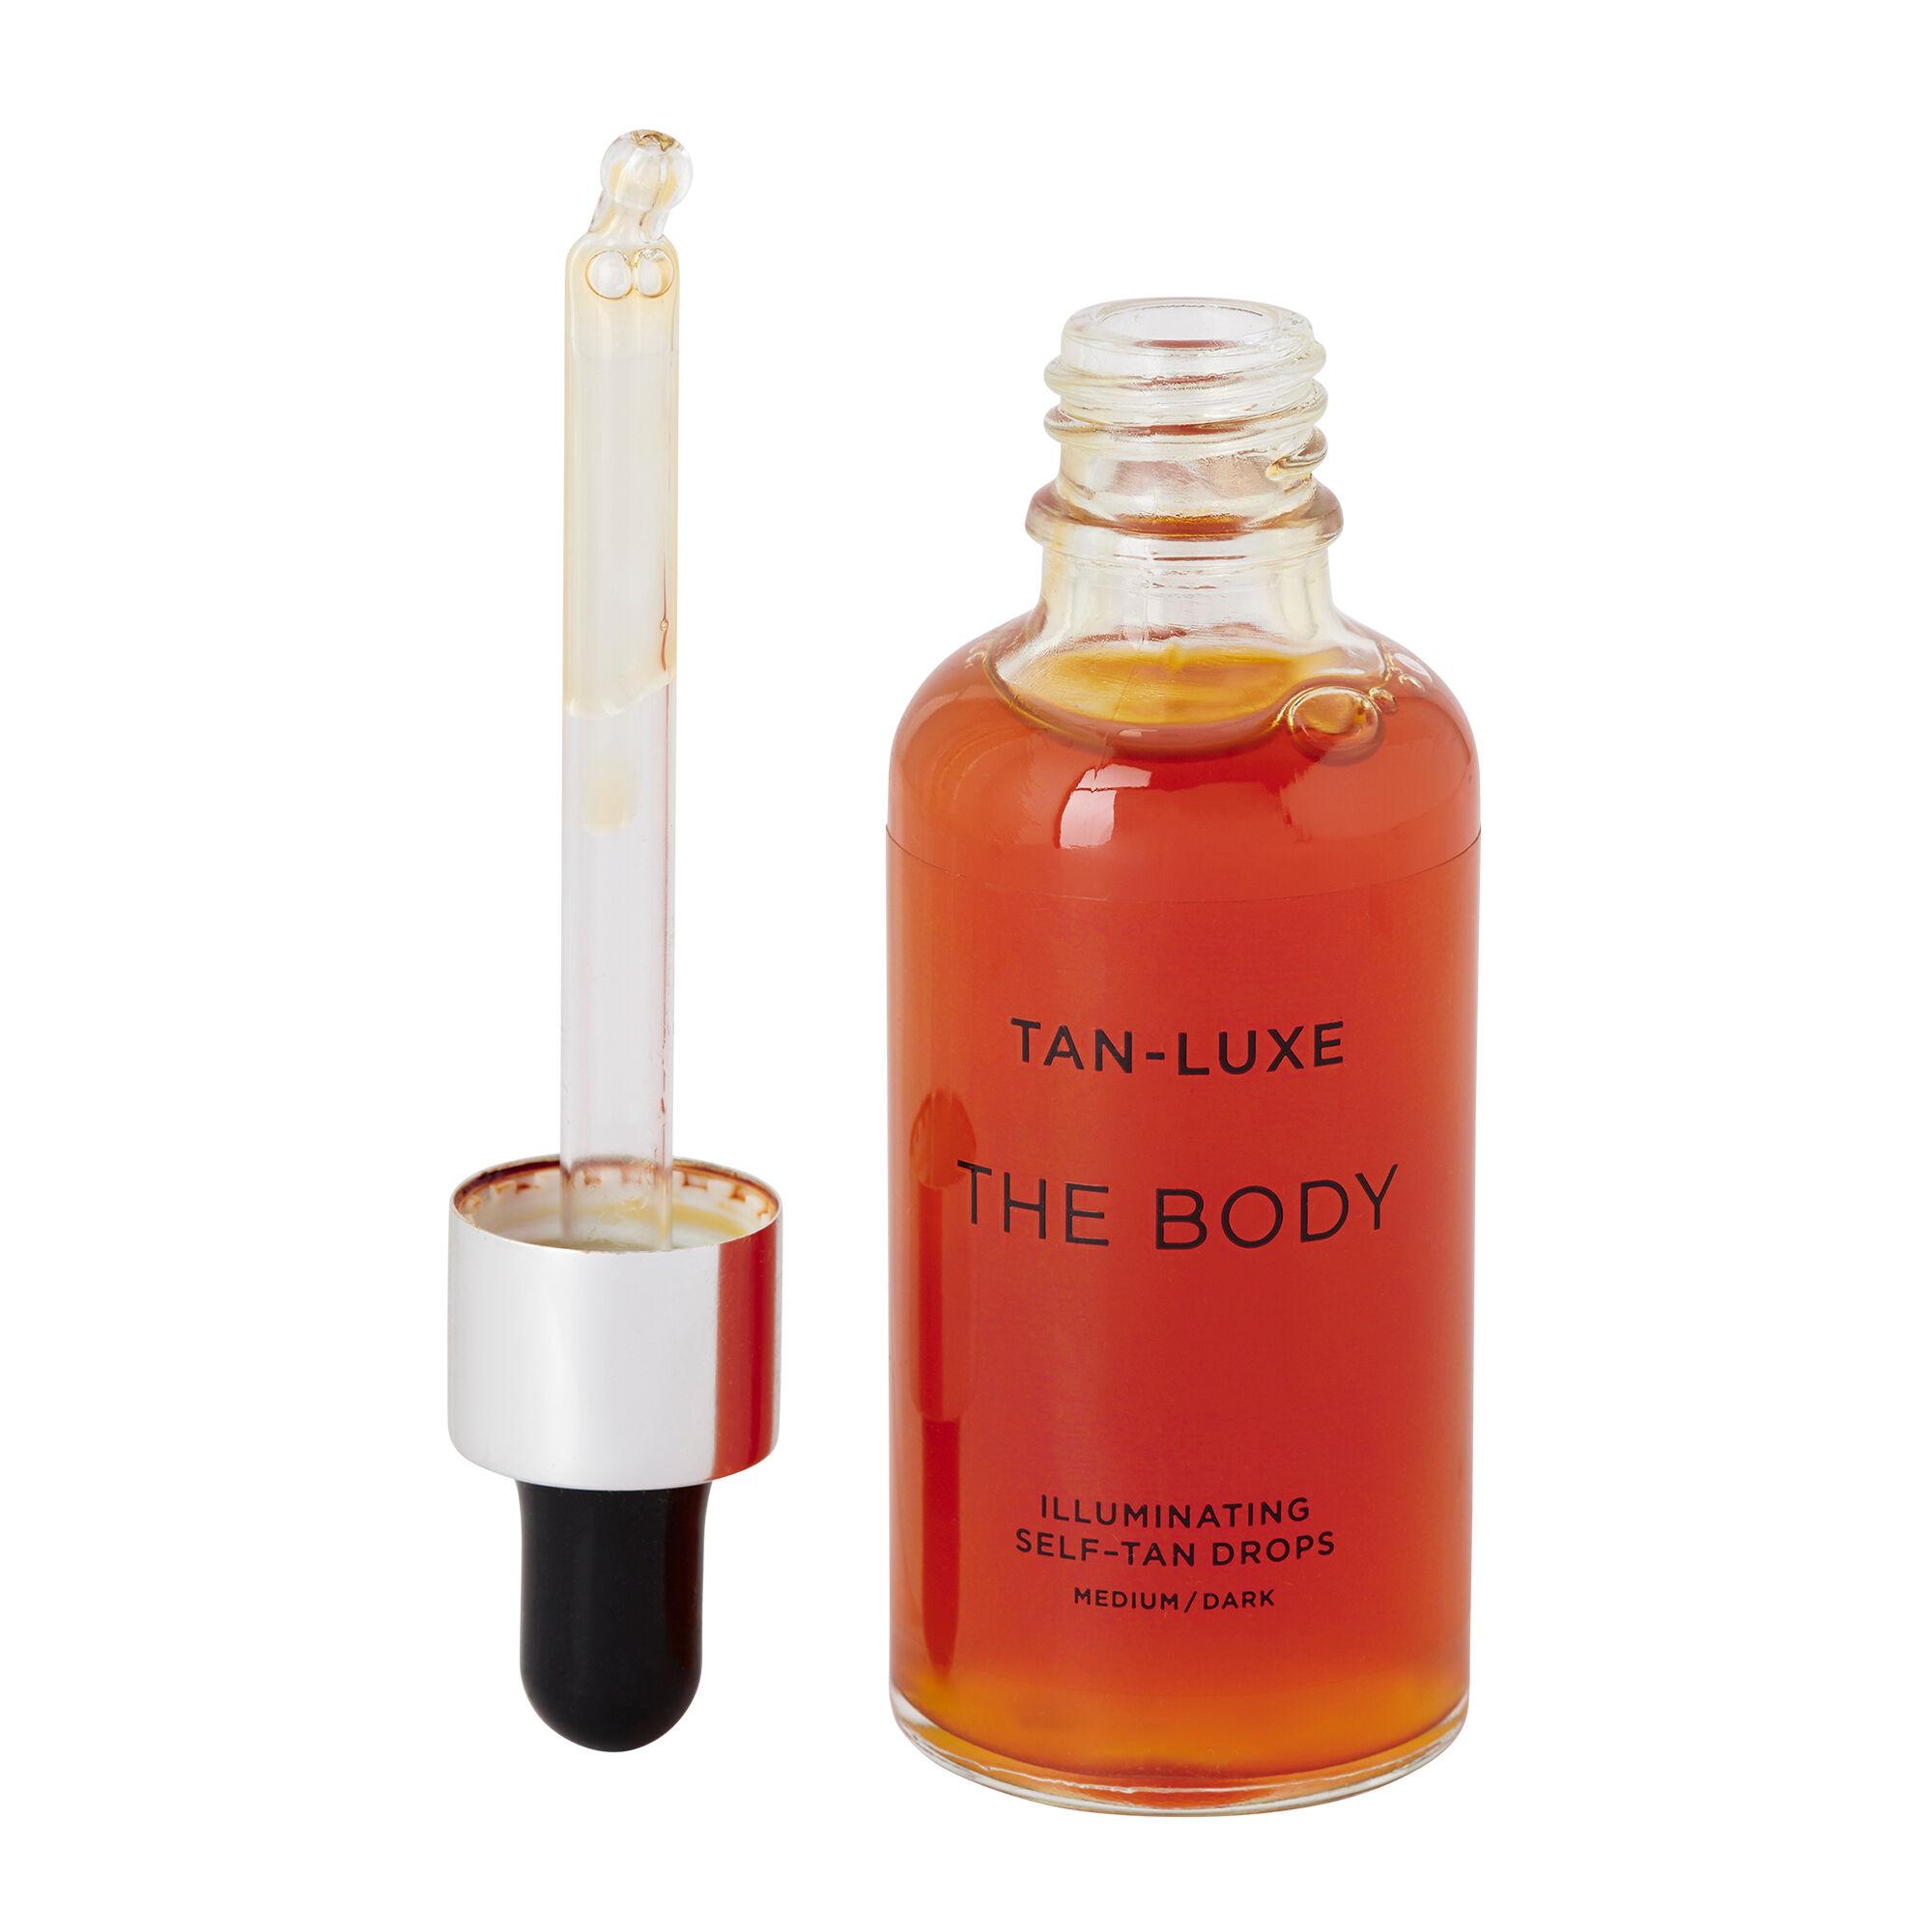 TAN-LUXE The BODY MediumDark 50ml